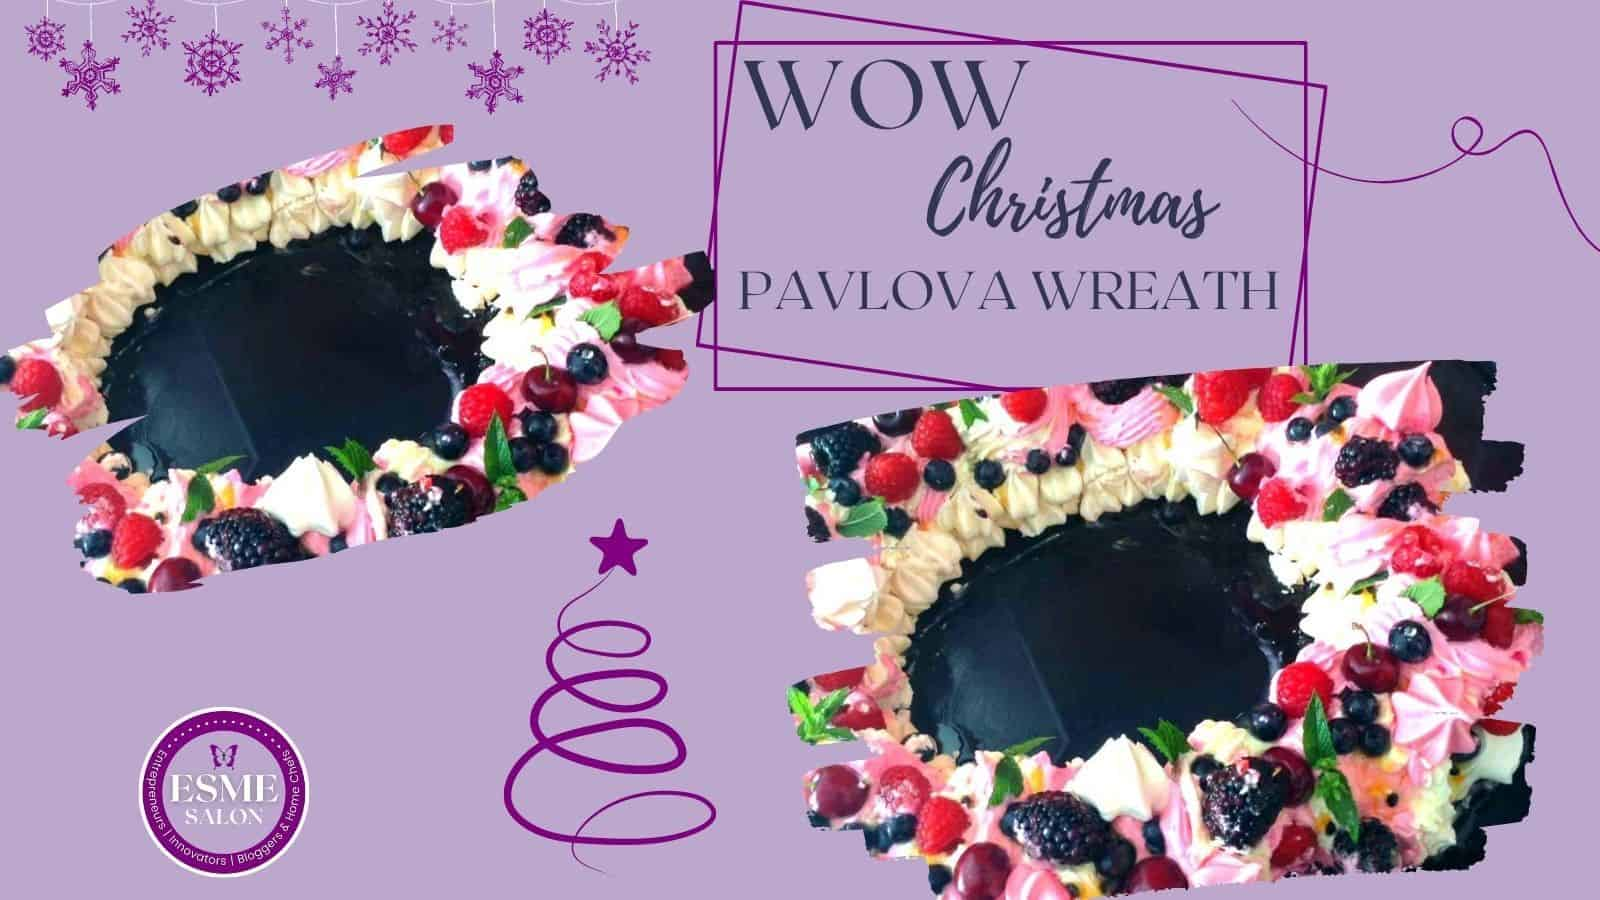 Gorgeous and delicious Christmas Pavlova